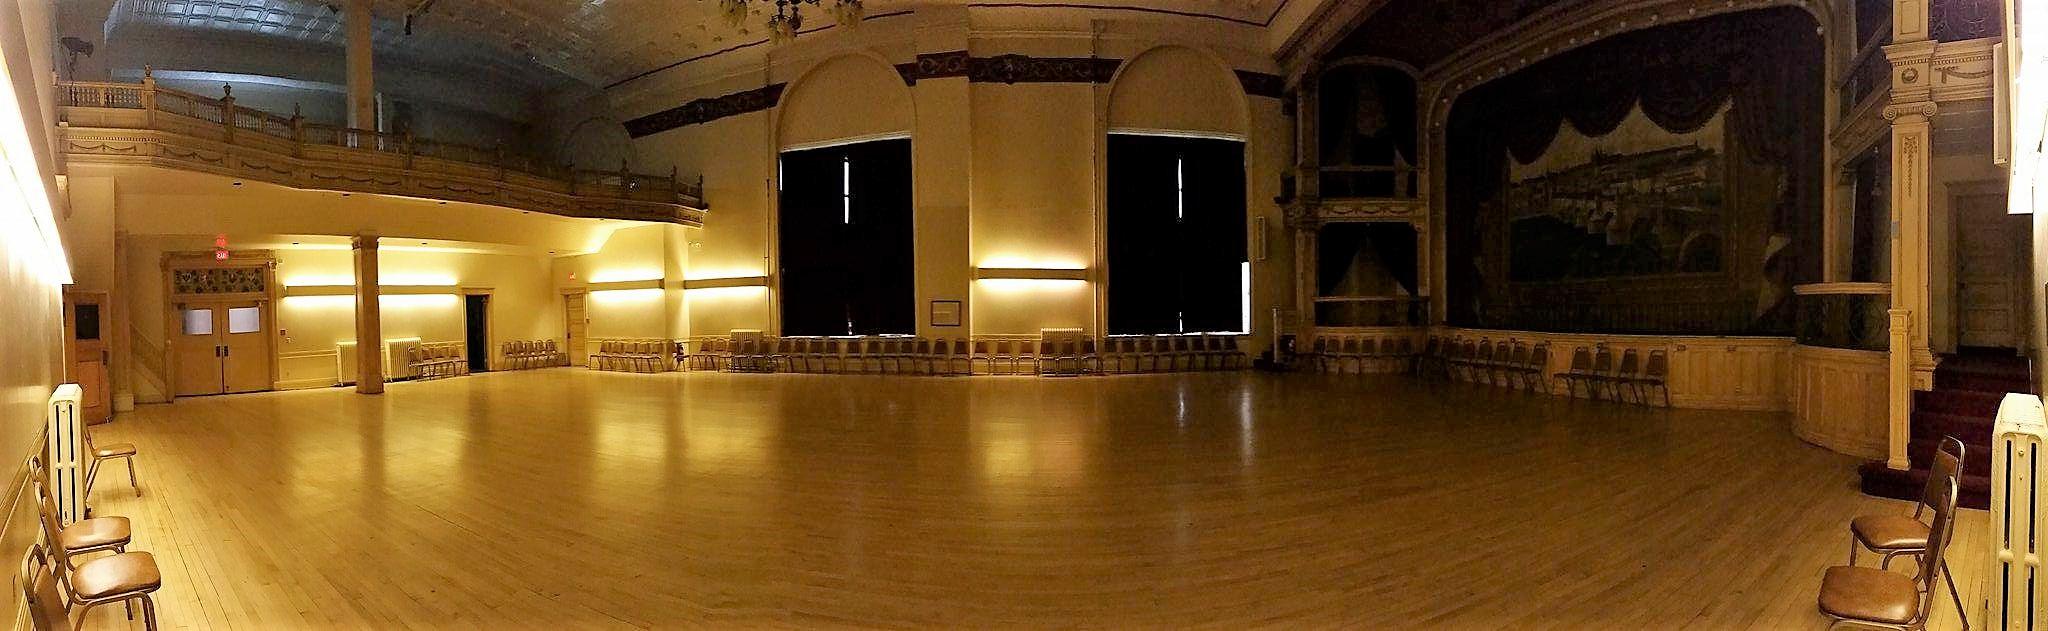 Bohemian National Hall ballroom panorama, Jan. 8, 2018